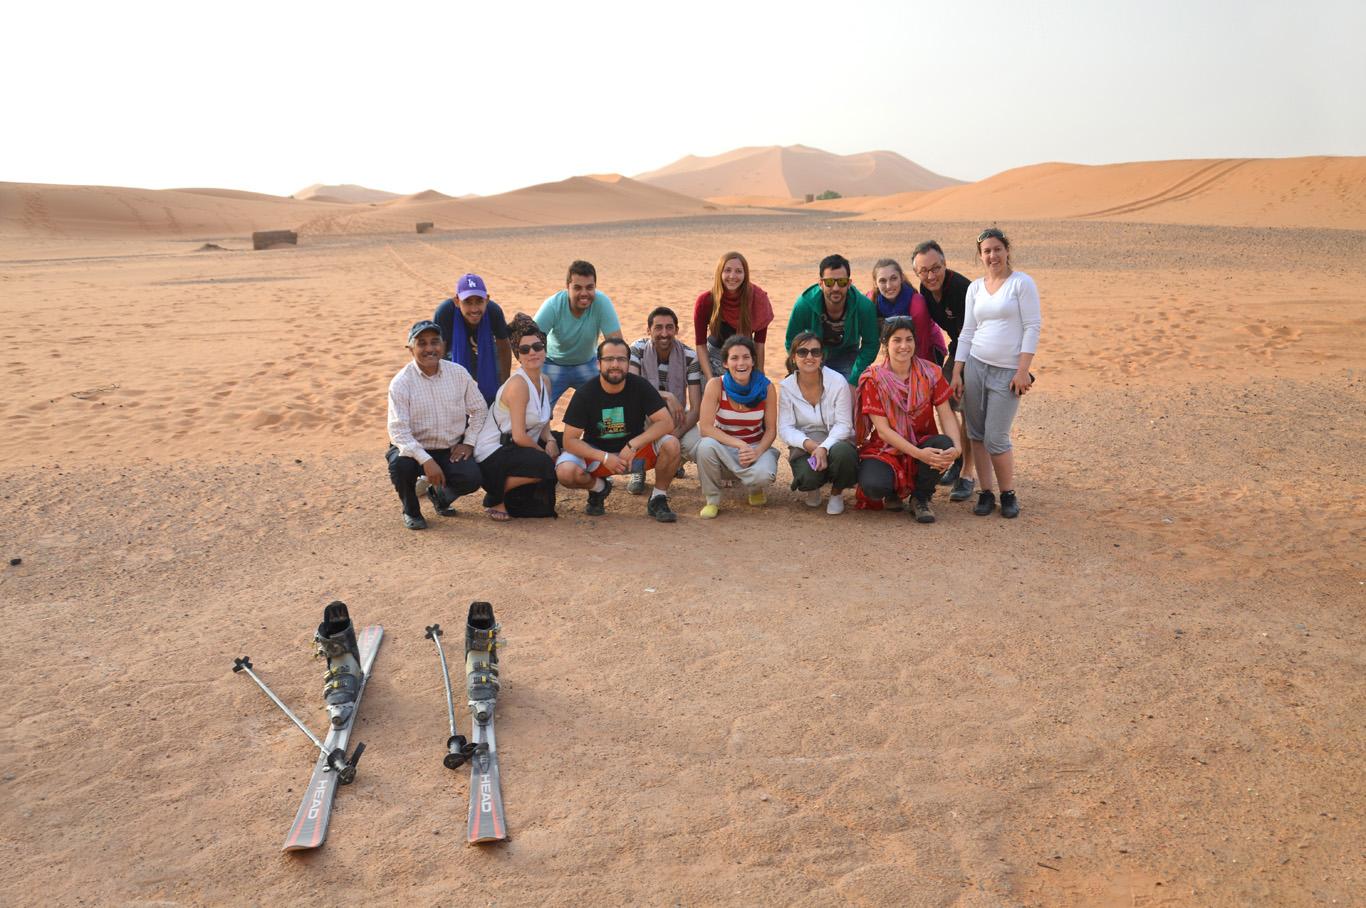 Our companions in Sahara